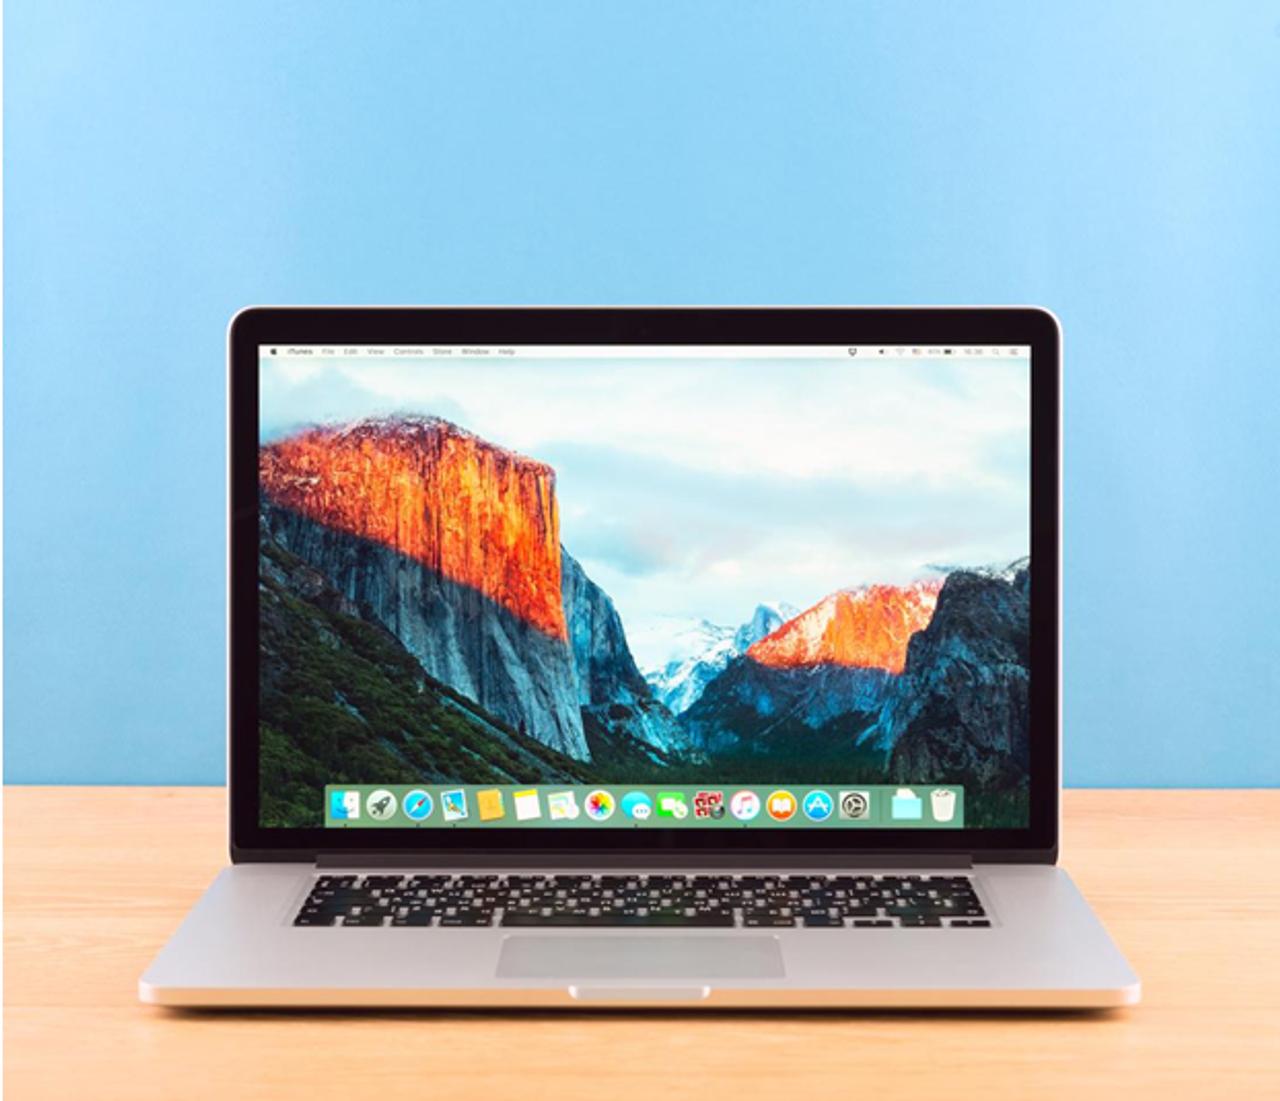 The Best Way to Trade In MacBook Pro